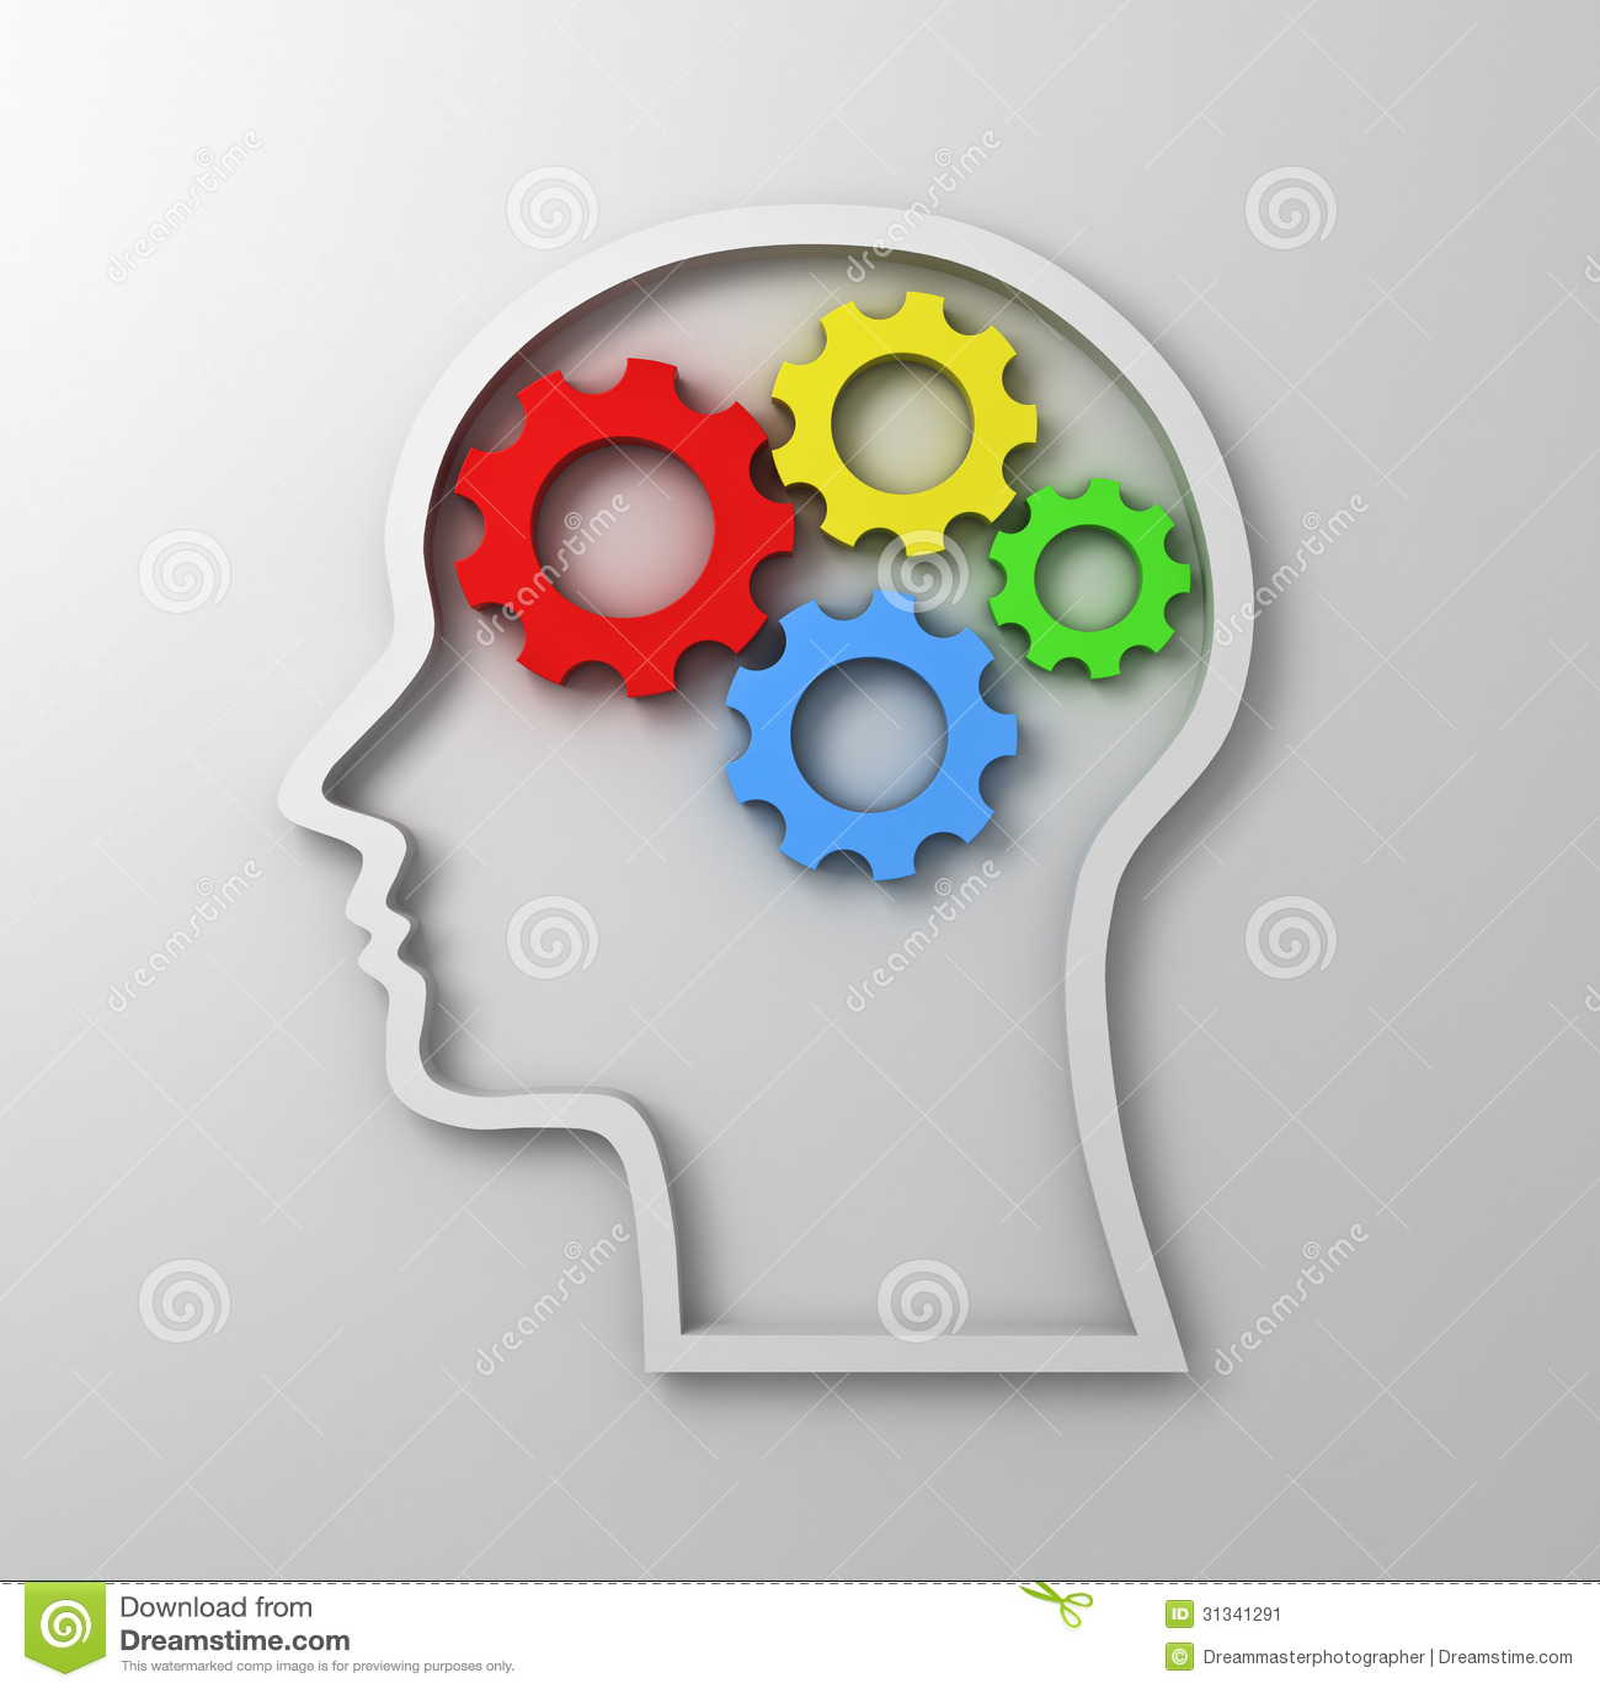 brain in head clipart - photo #10